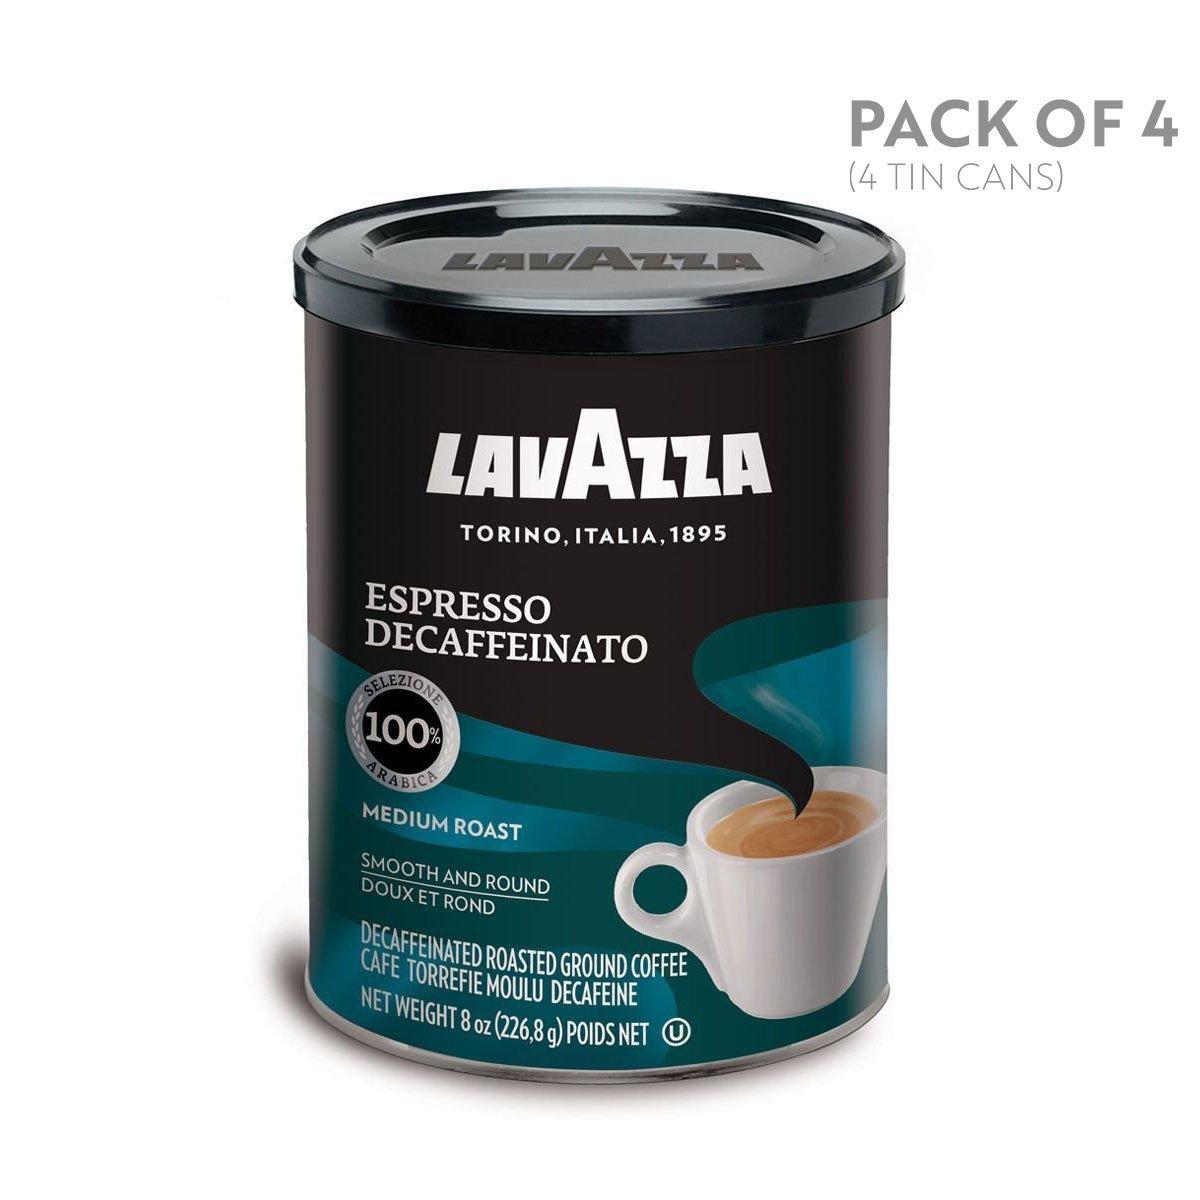 Lavazza Espresso Decaffeinated Ground Coffee, 8 oz